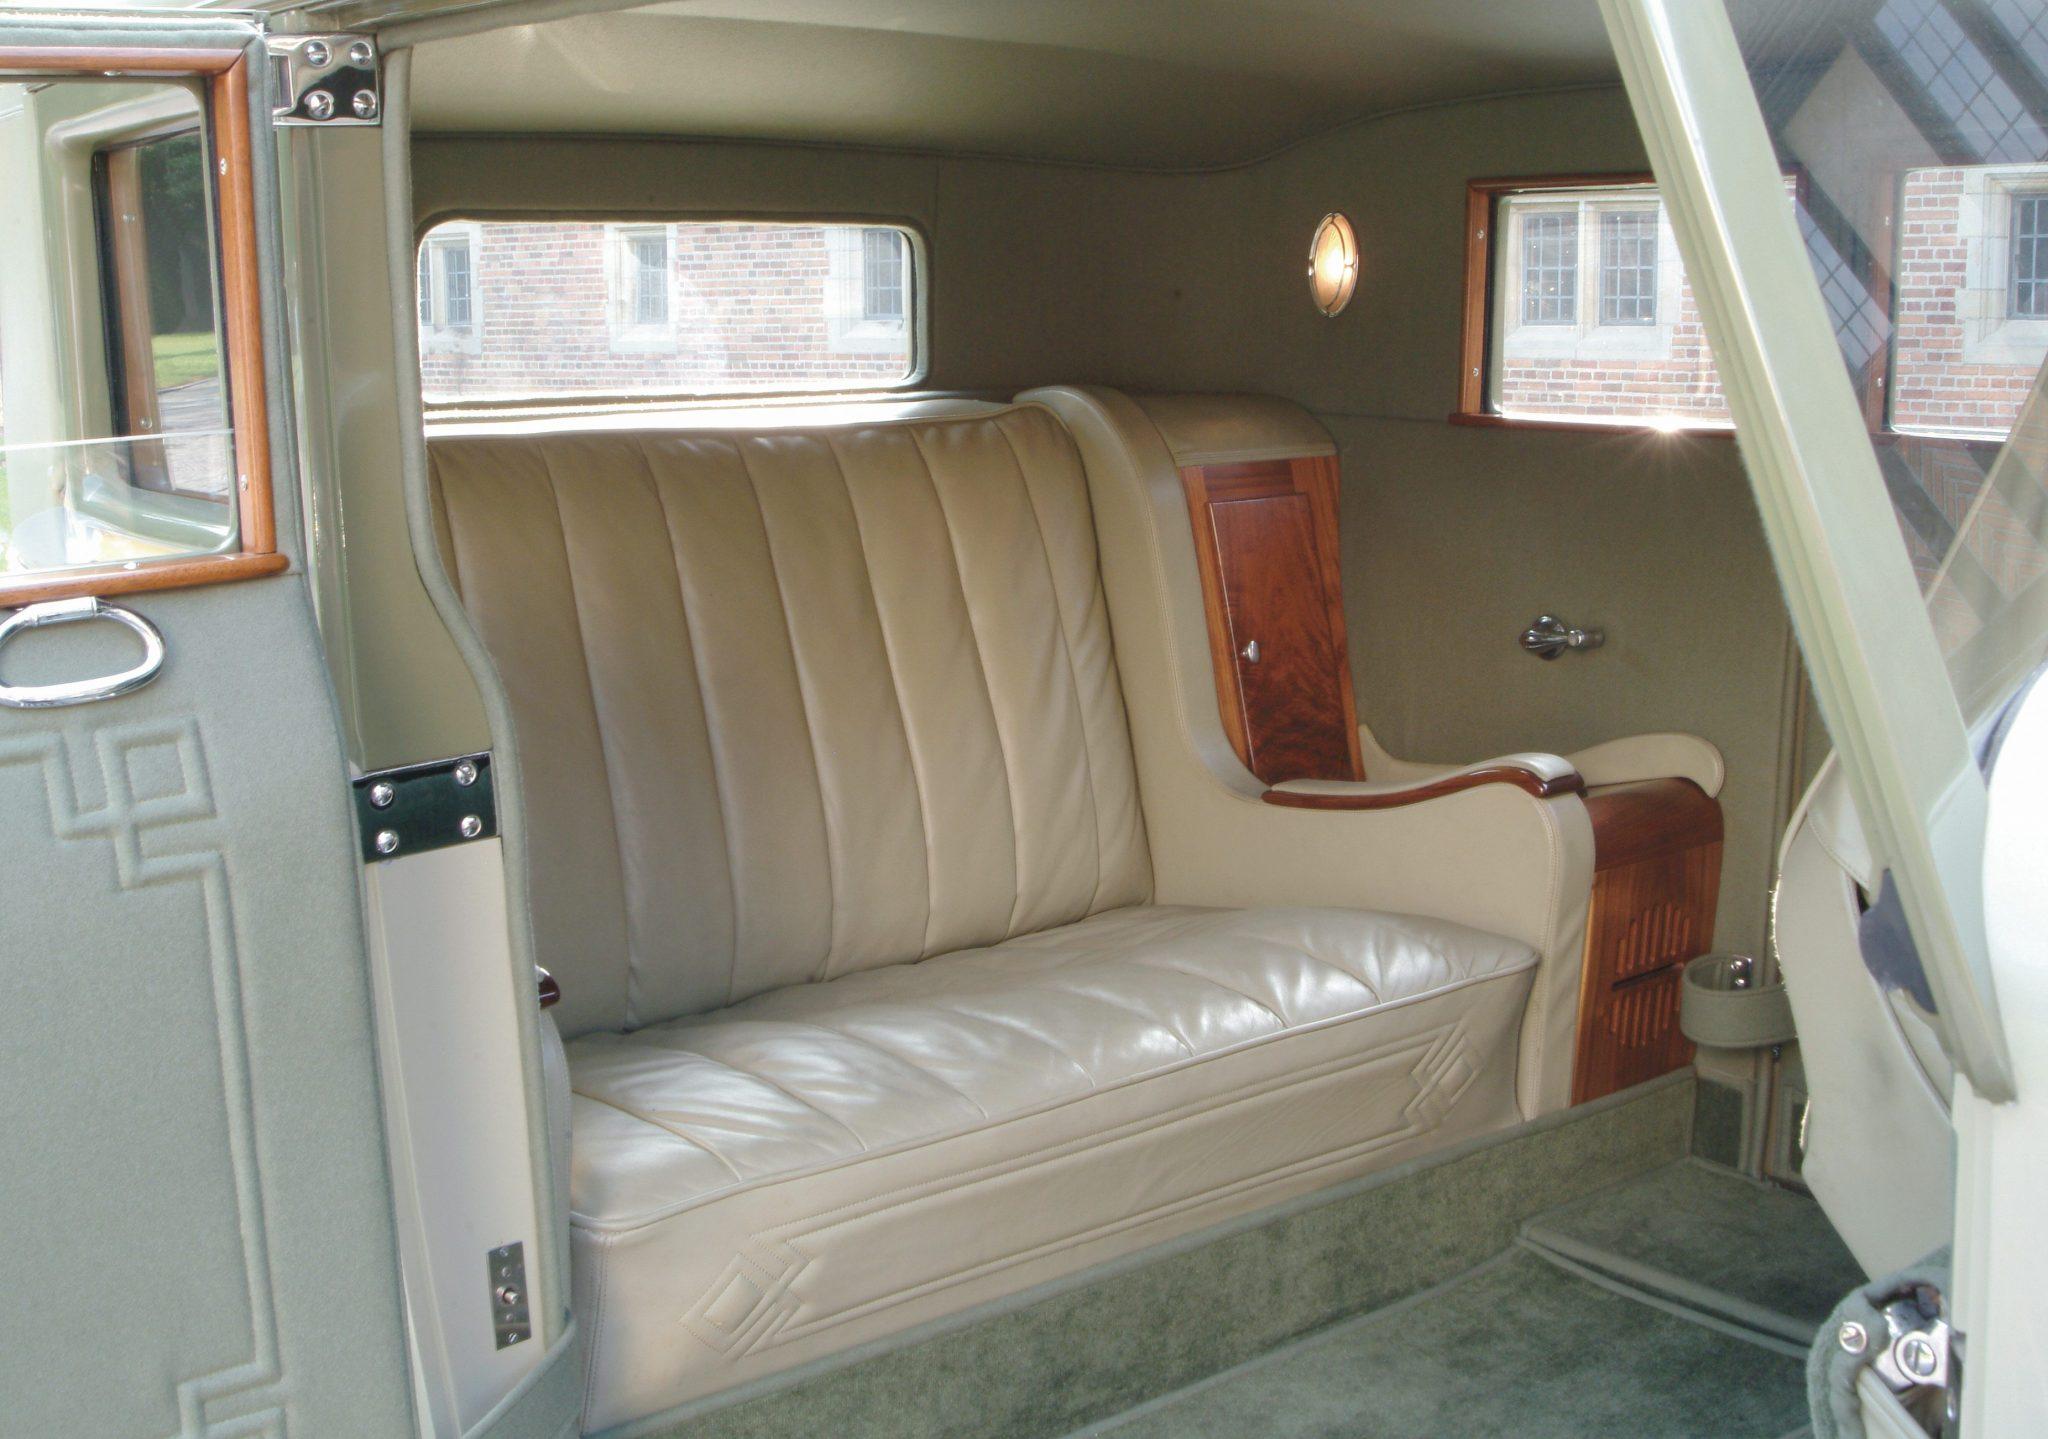 1932 Duesenberg Model J Victoria Coupe Interior and Radio